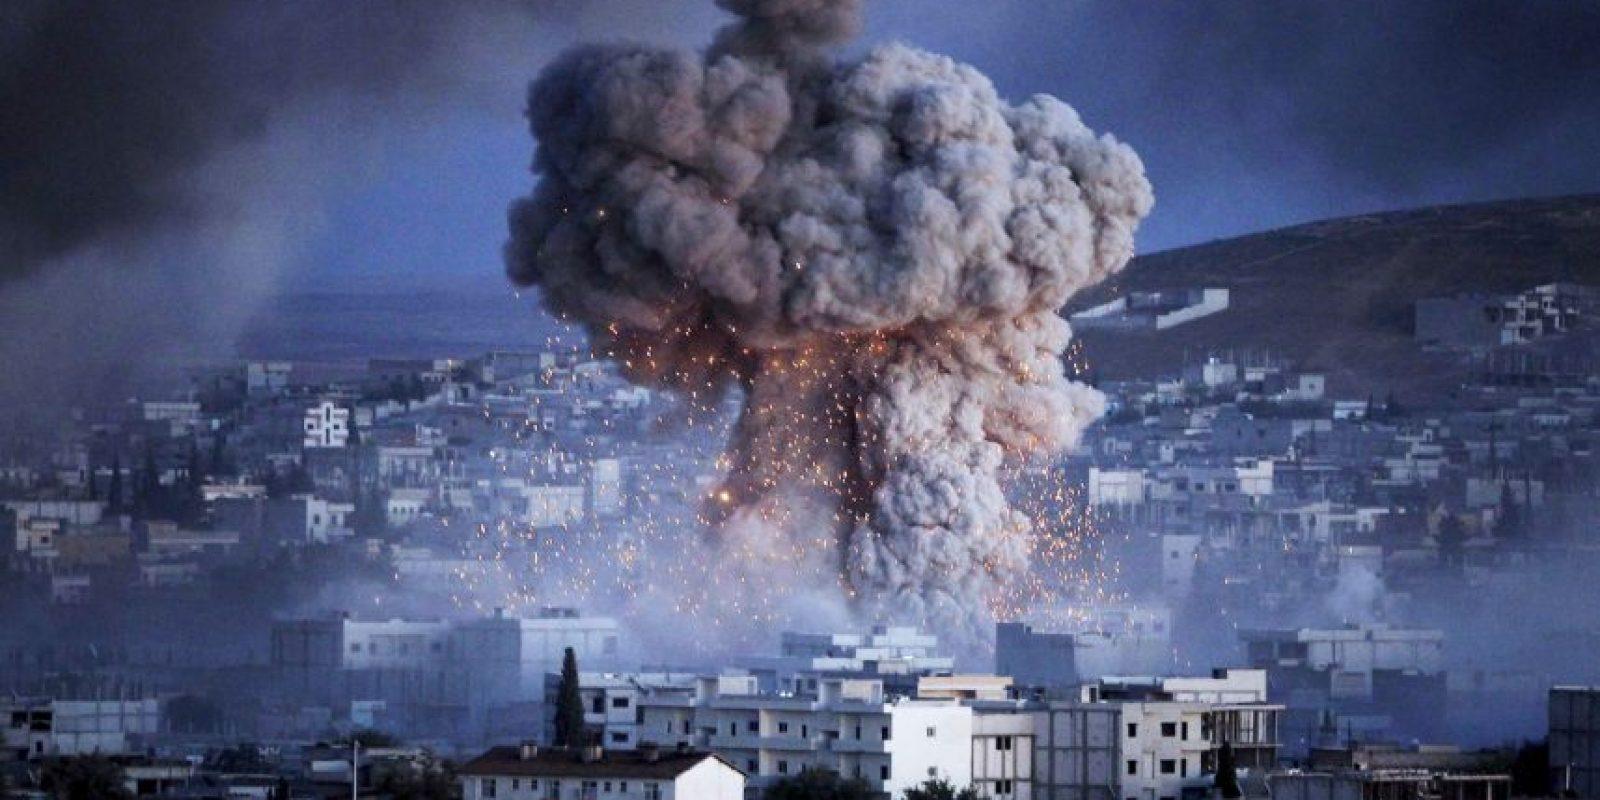 La problemática en Siria inició casi desde que el presidente actual Bashar Hafez Al-Assad comenzó a gobernar. Foto:Getty Images